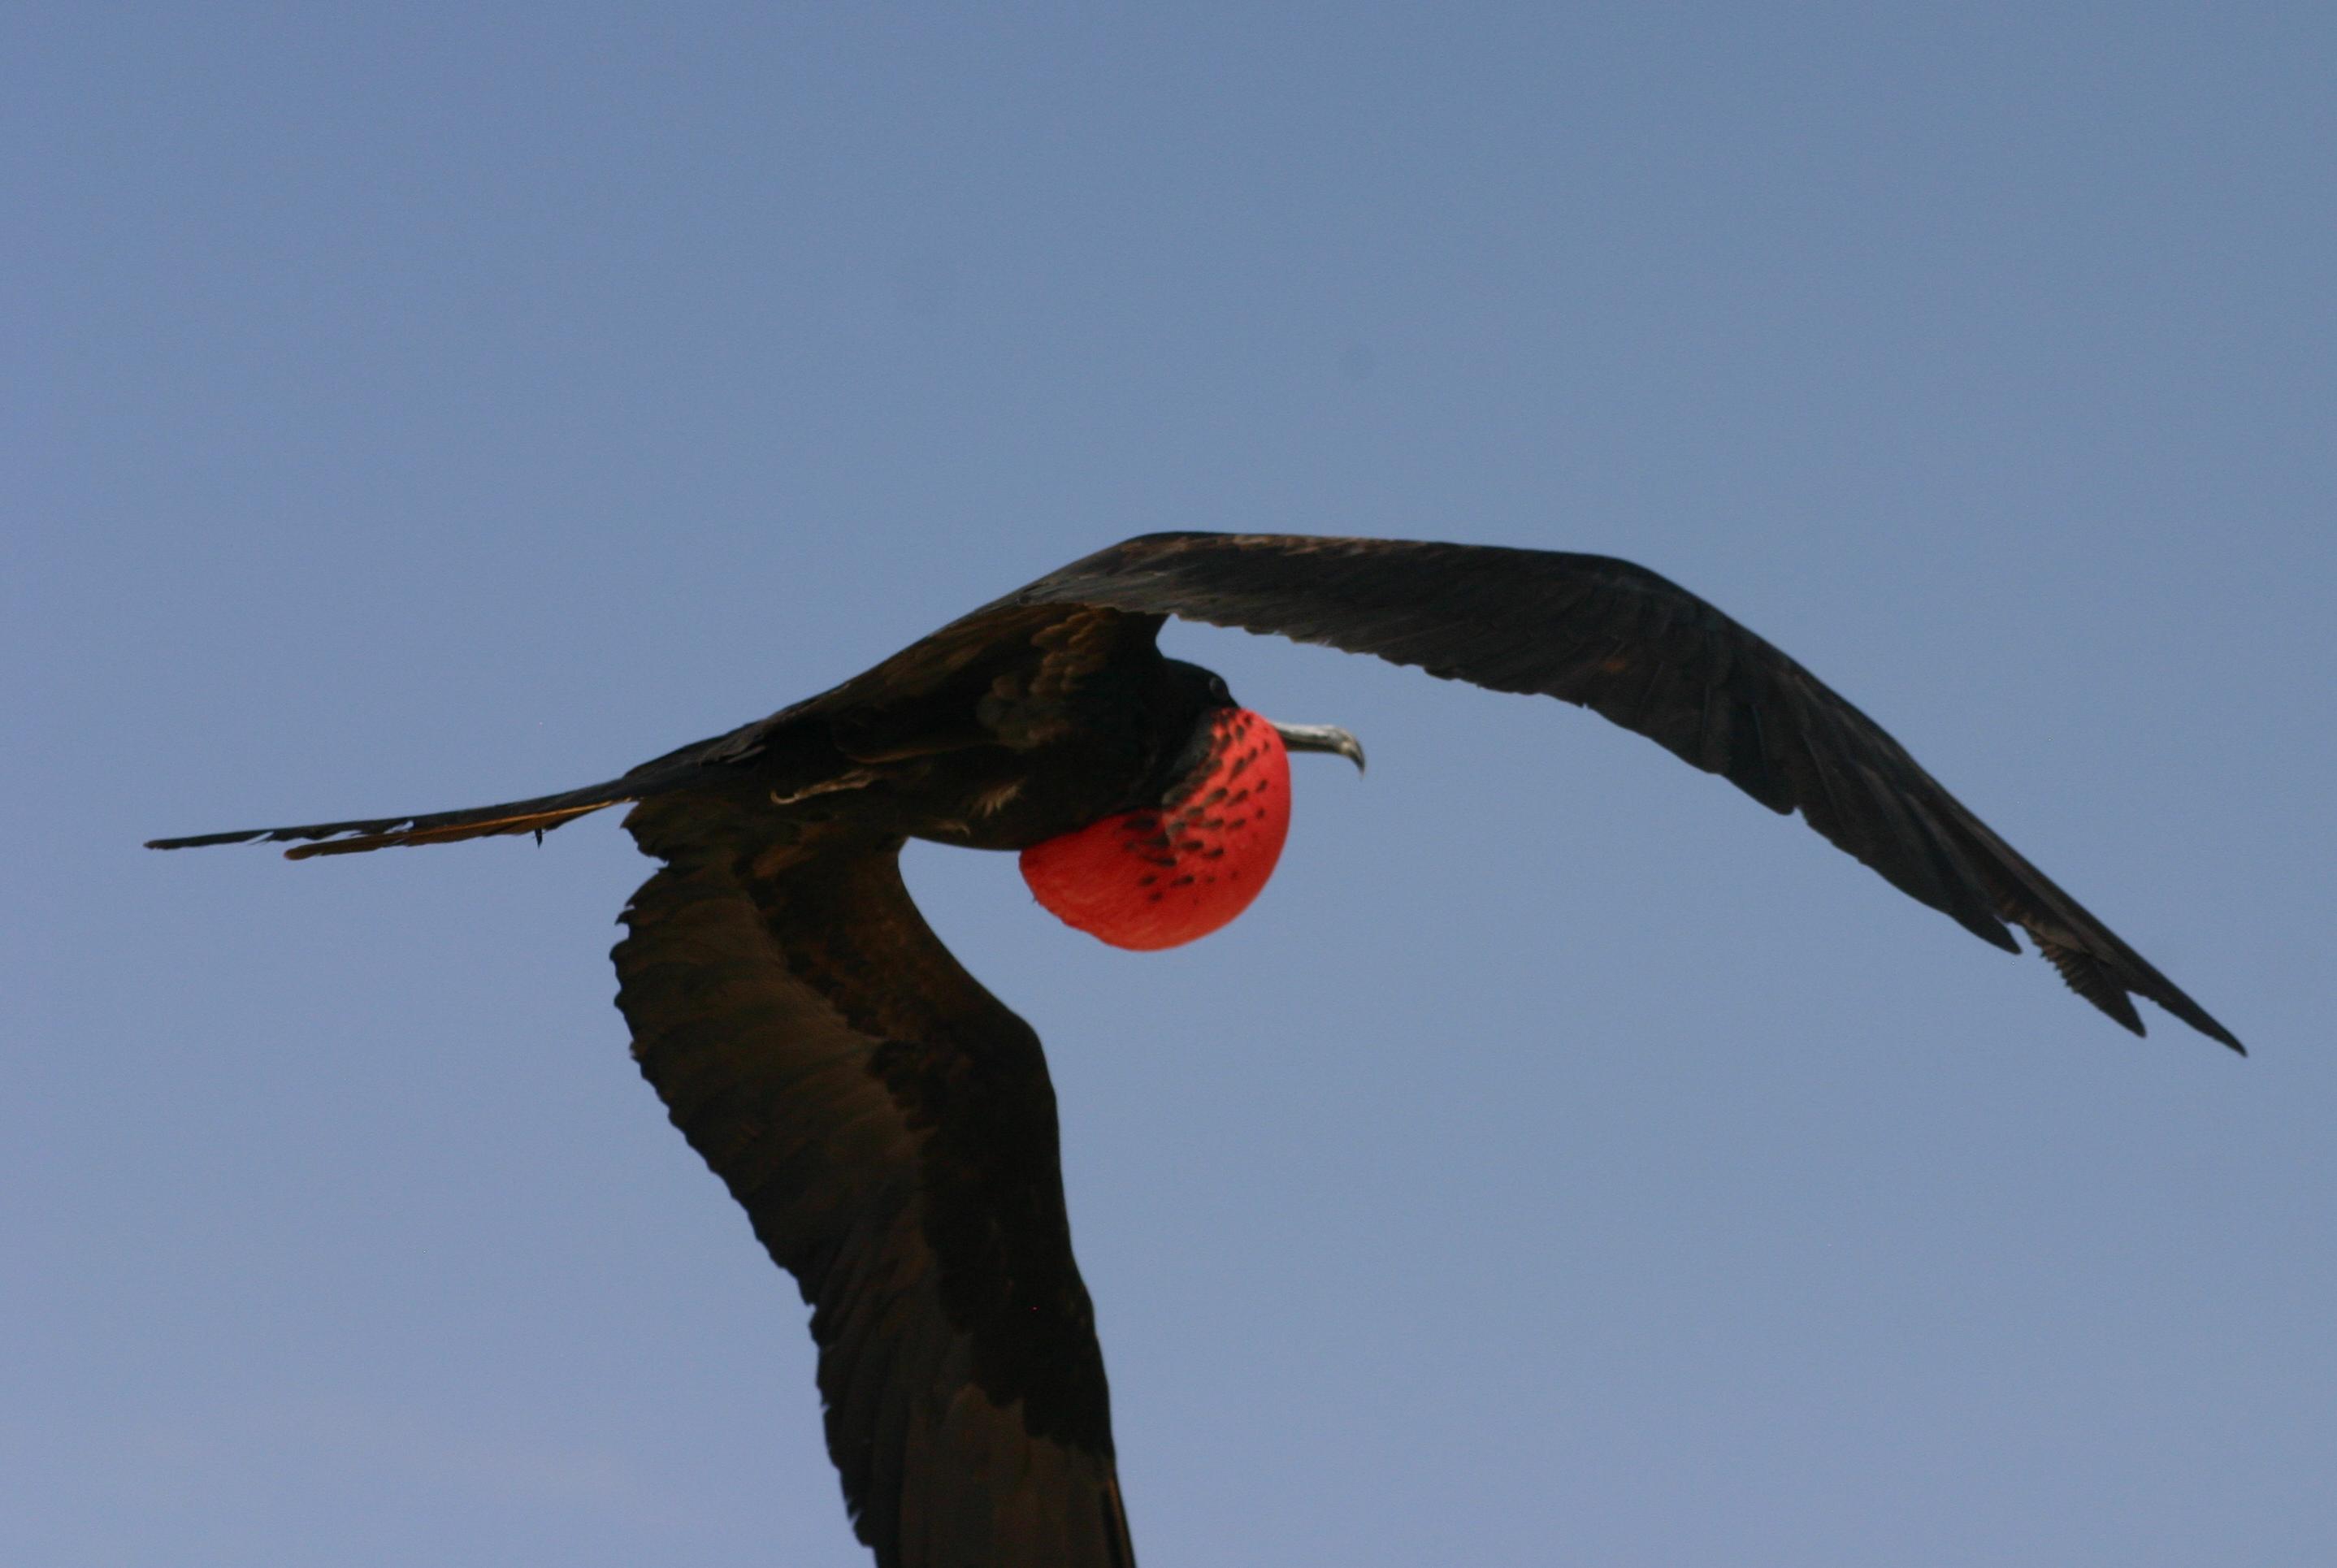 Frigate bird speed graphic freeuse download File:Male greater frigate bird in flight.jpg - Wikimedia Commons graphic freeuse download